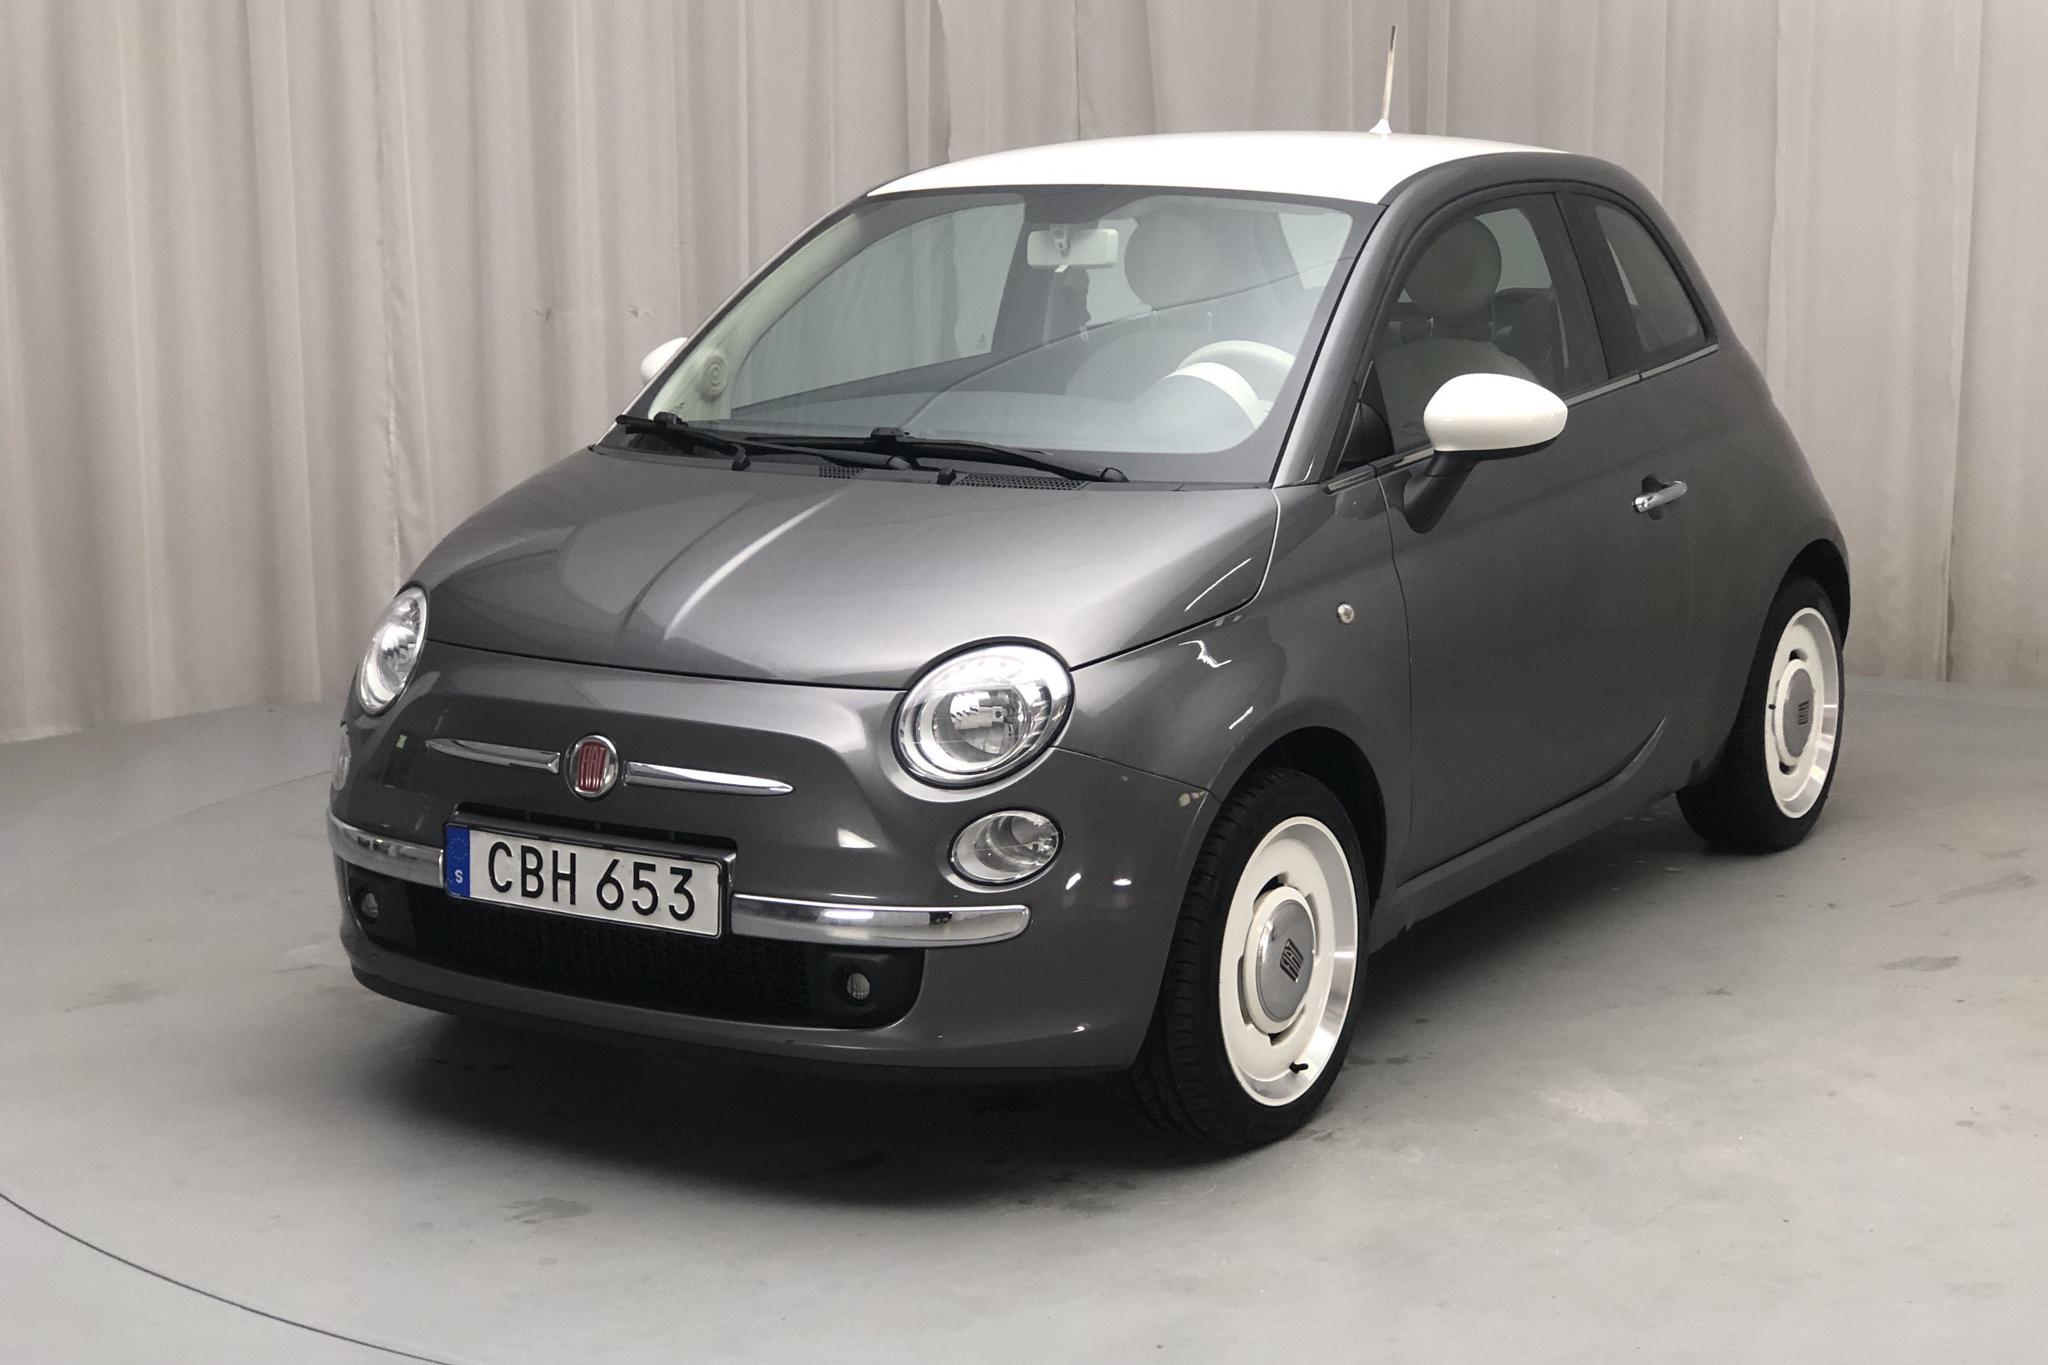 Fiat 500 1.2 (69hk) - 3 946 mil - Manuell - grå - 2015